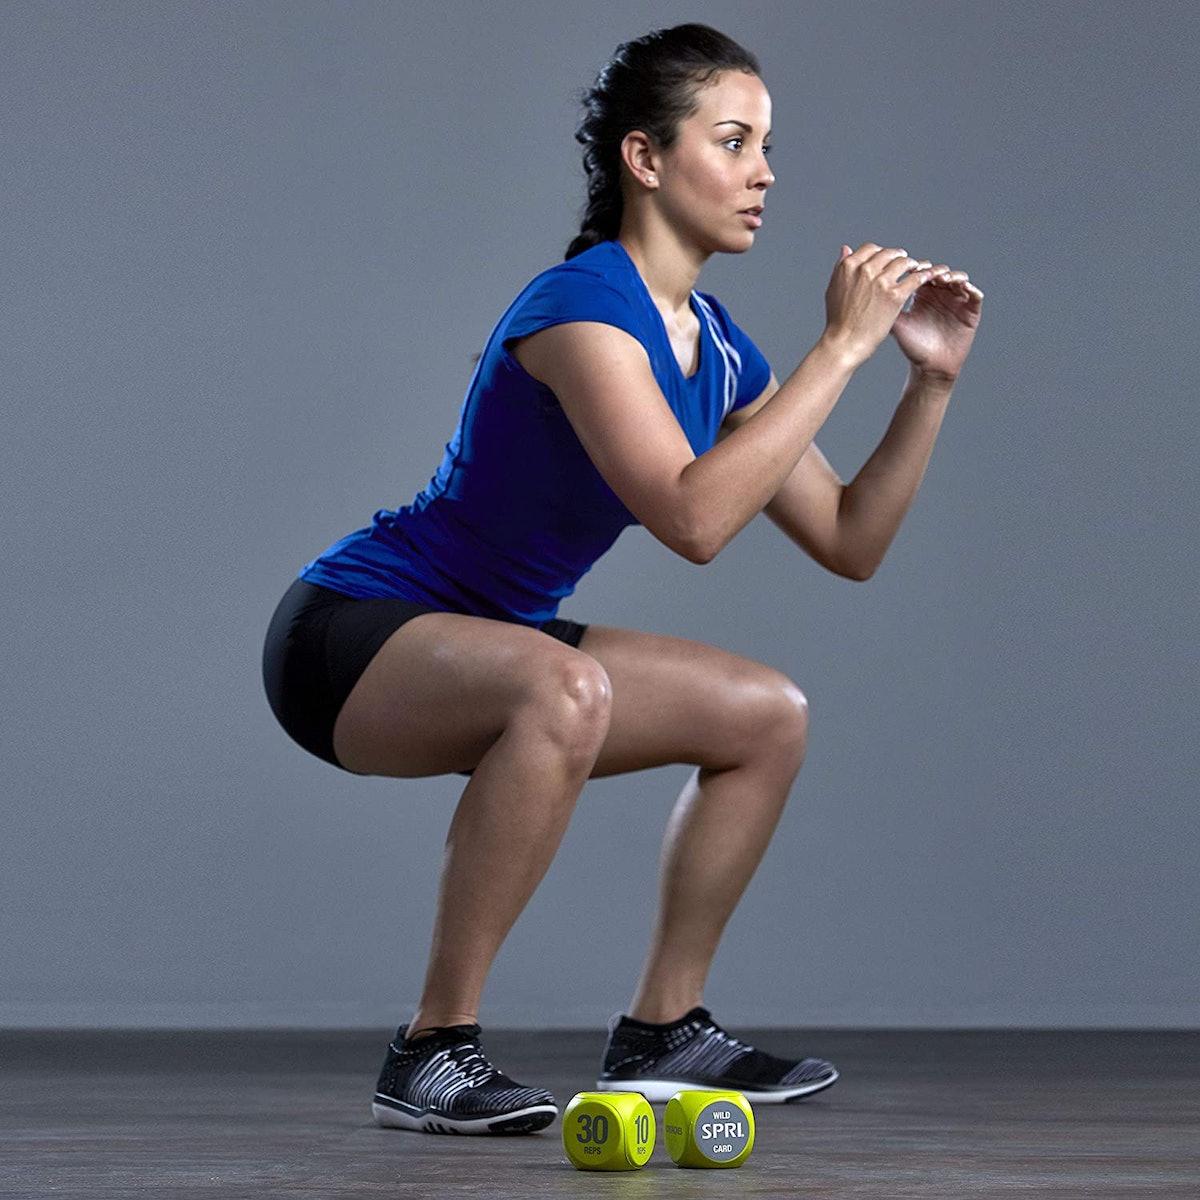 SPRI Exercise Dice (6-Sided)